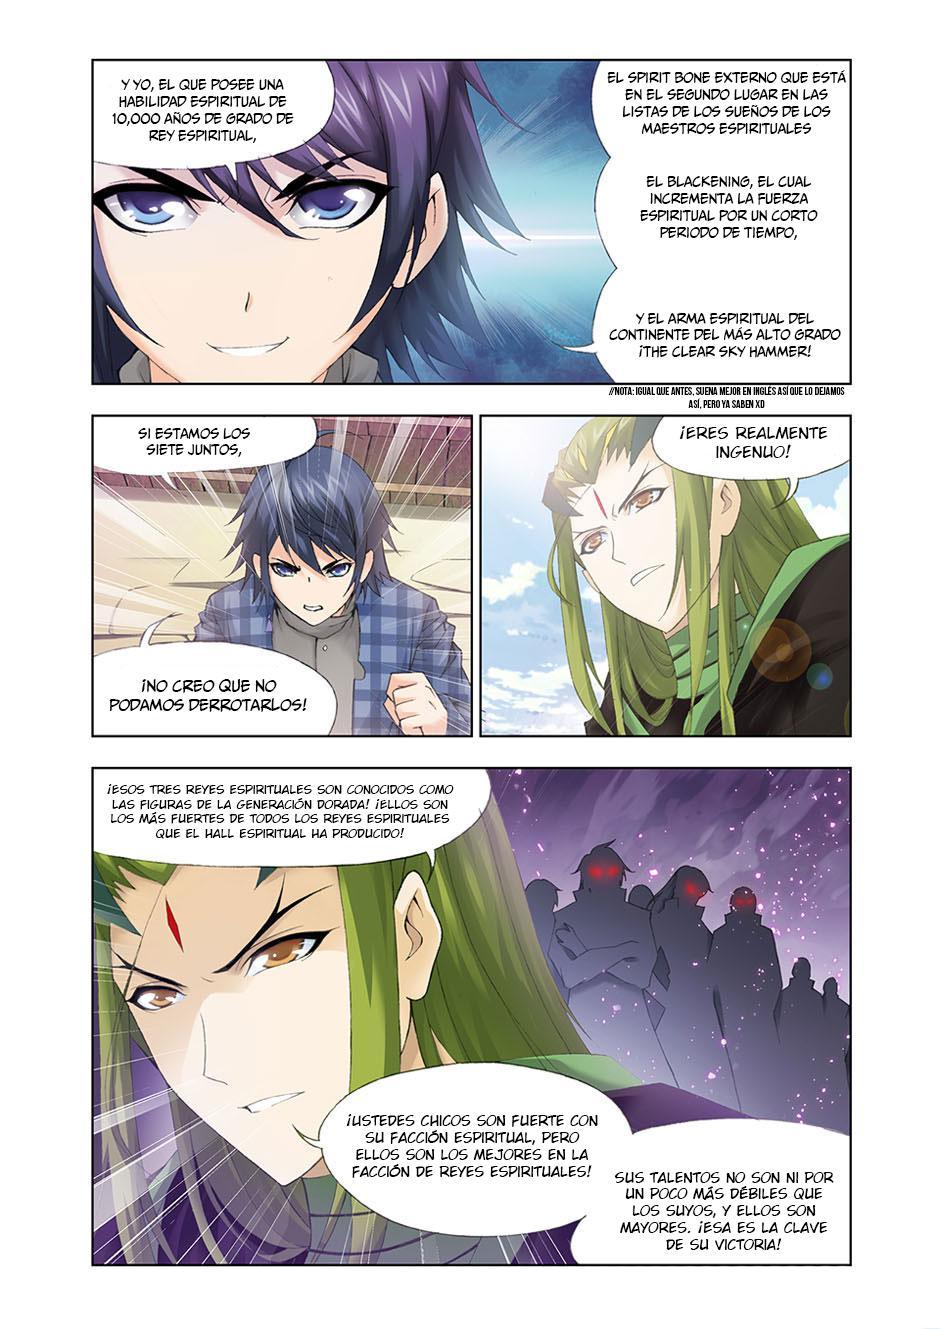 http://c5.ninemanga.com/es_manga/18/16210/417006/21ea0396c61ba3b8f89aa0a75a1a36a7.jpg Page 6